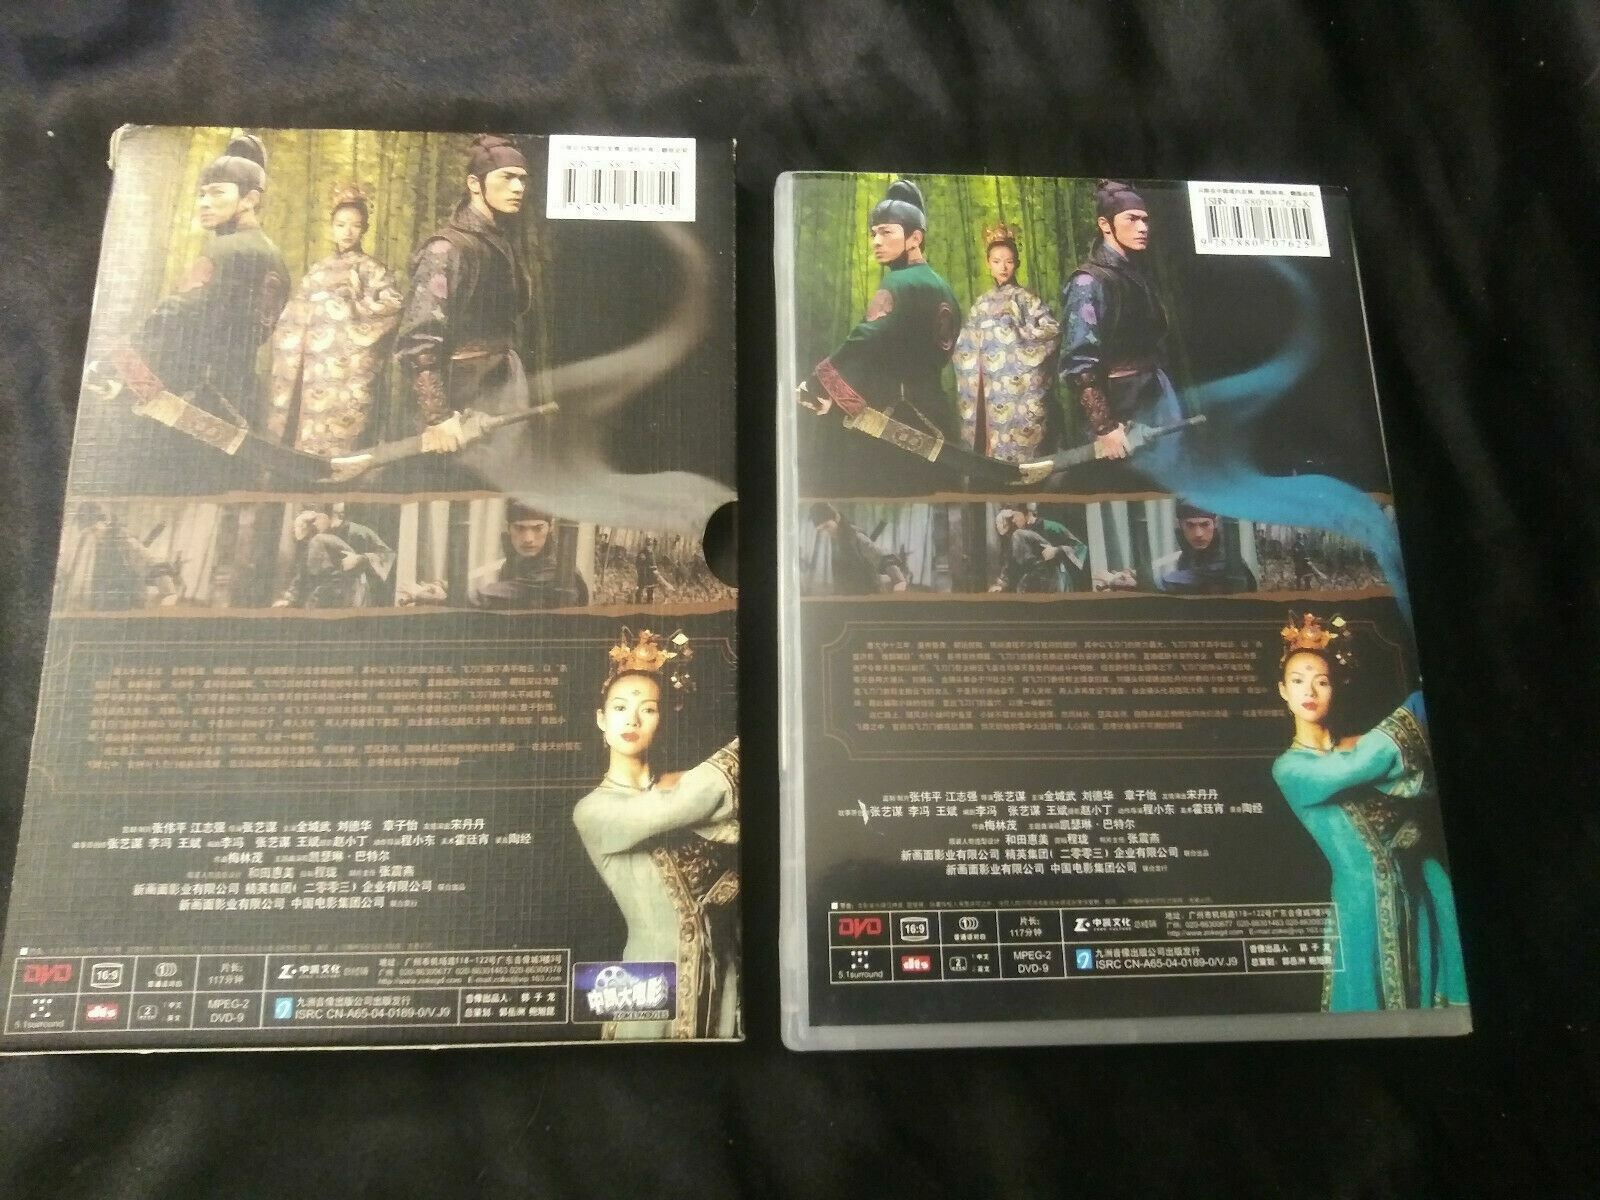 House Of Flying Daggers Region 2 DVD Zoke Movies 9 Japanese Import - $8.00